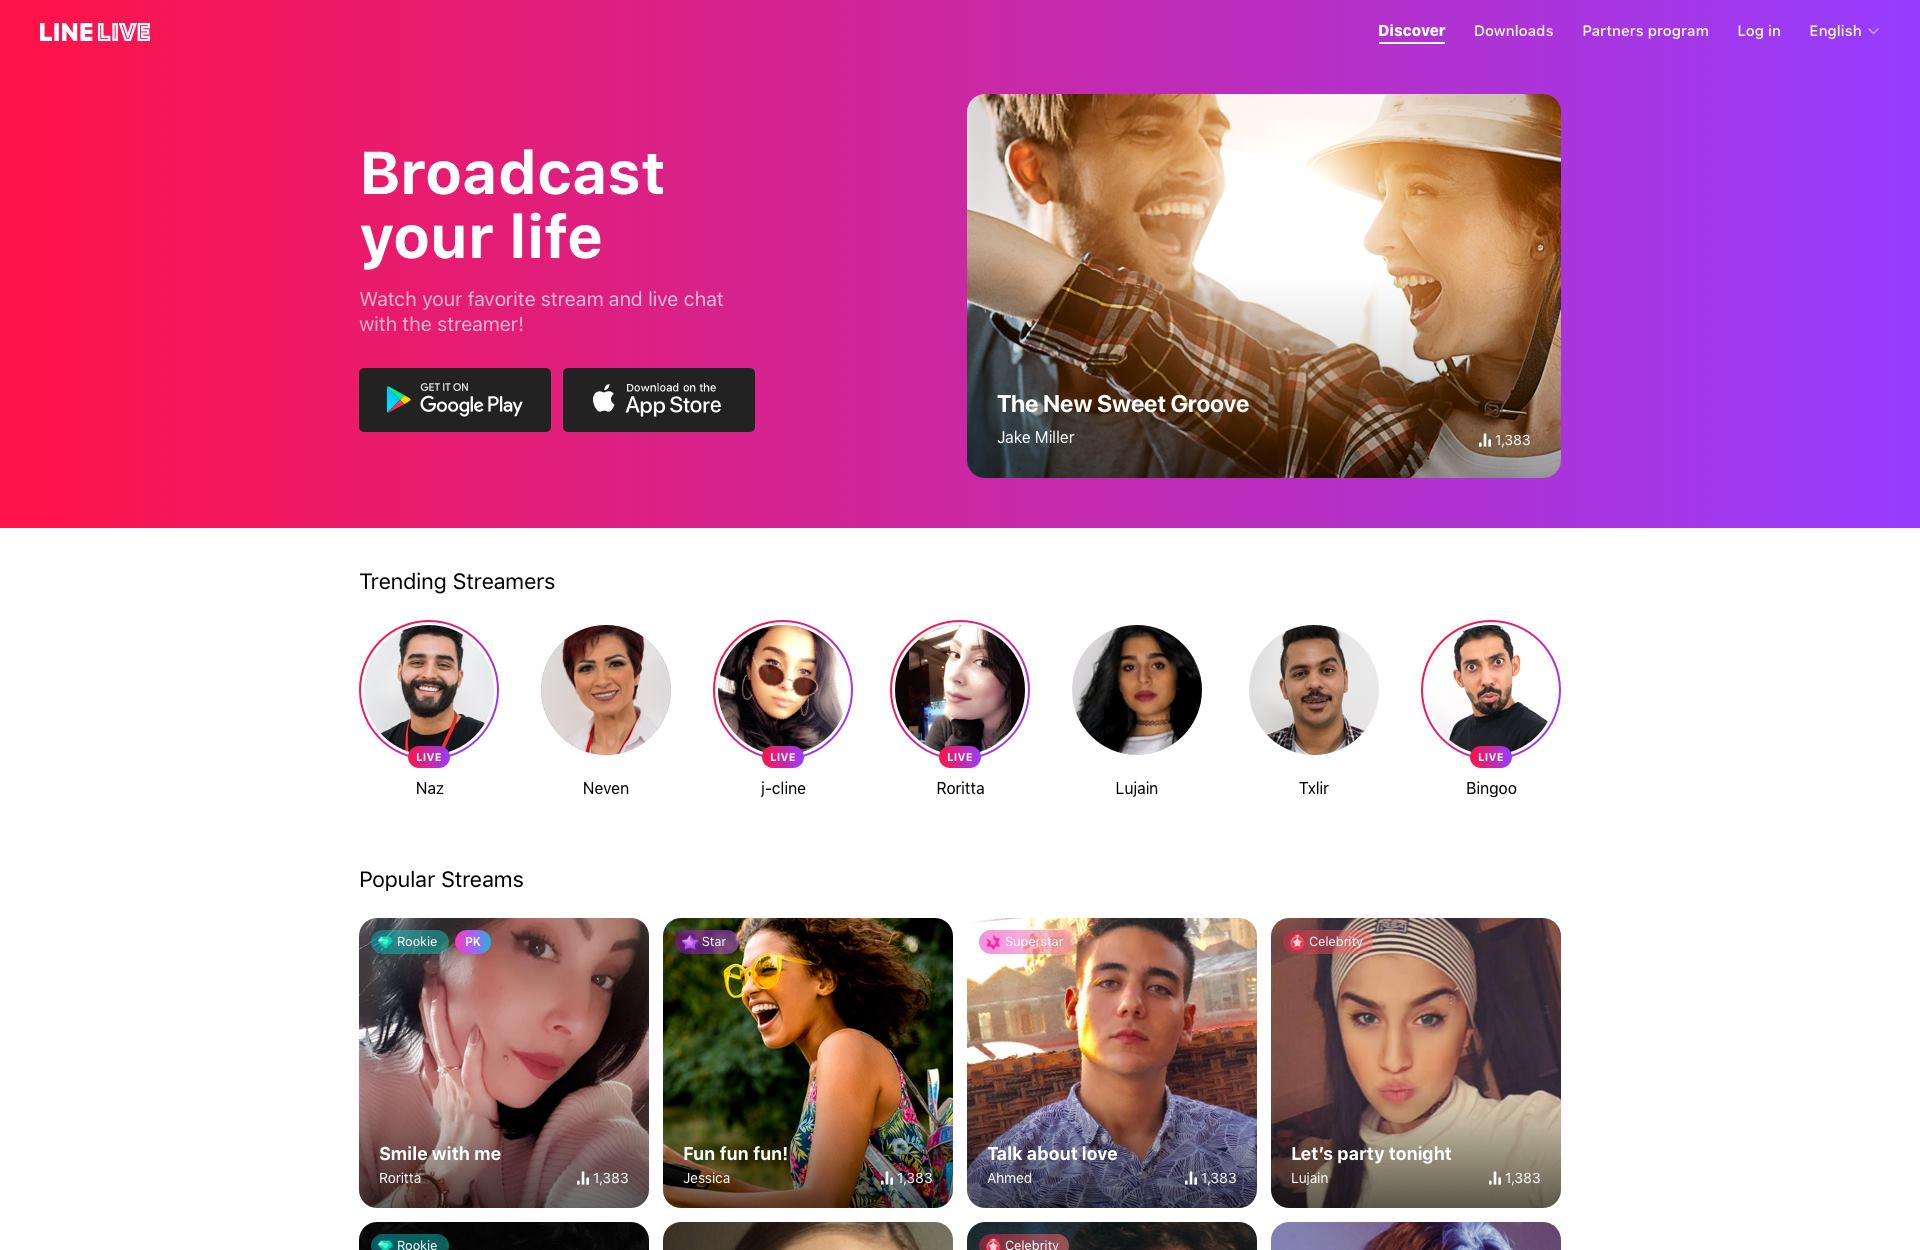 line app trending streamers and popular streams